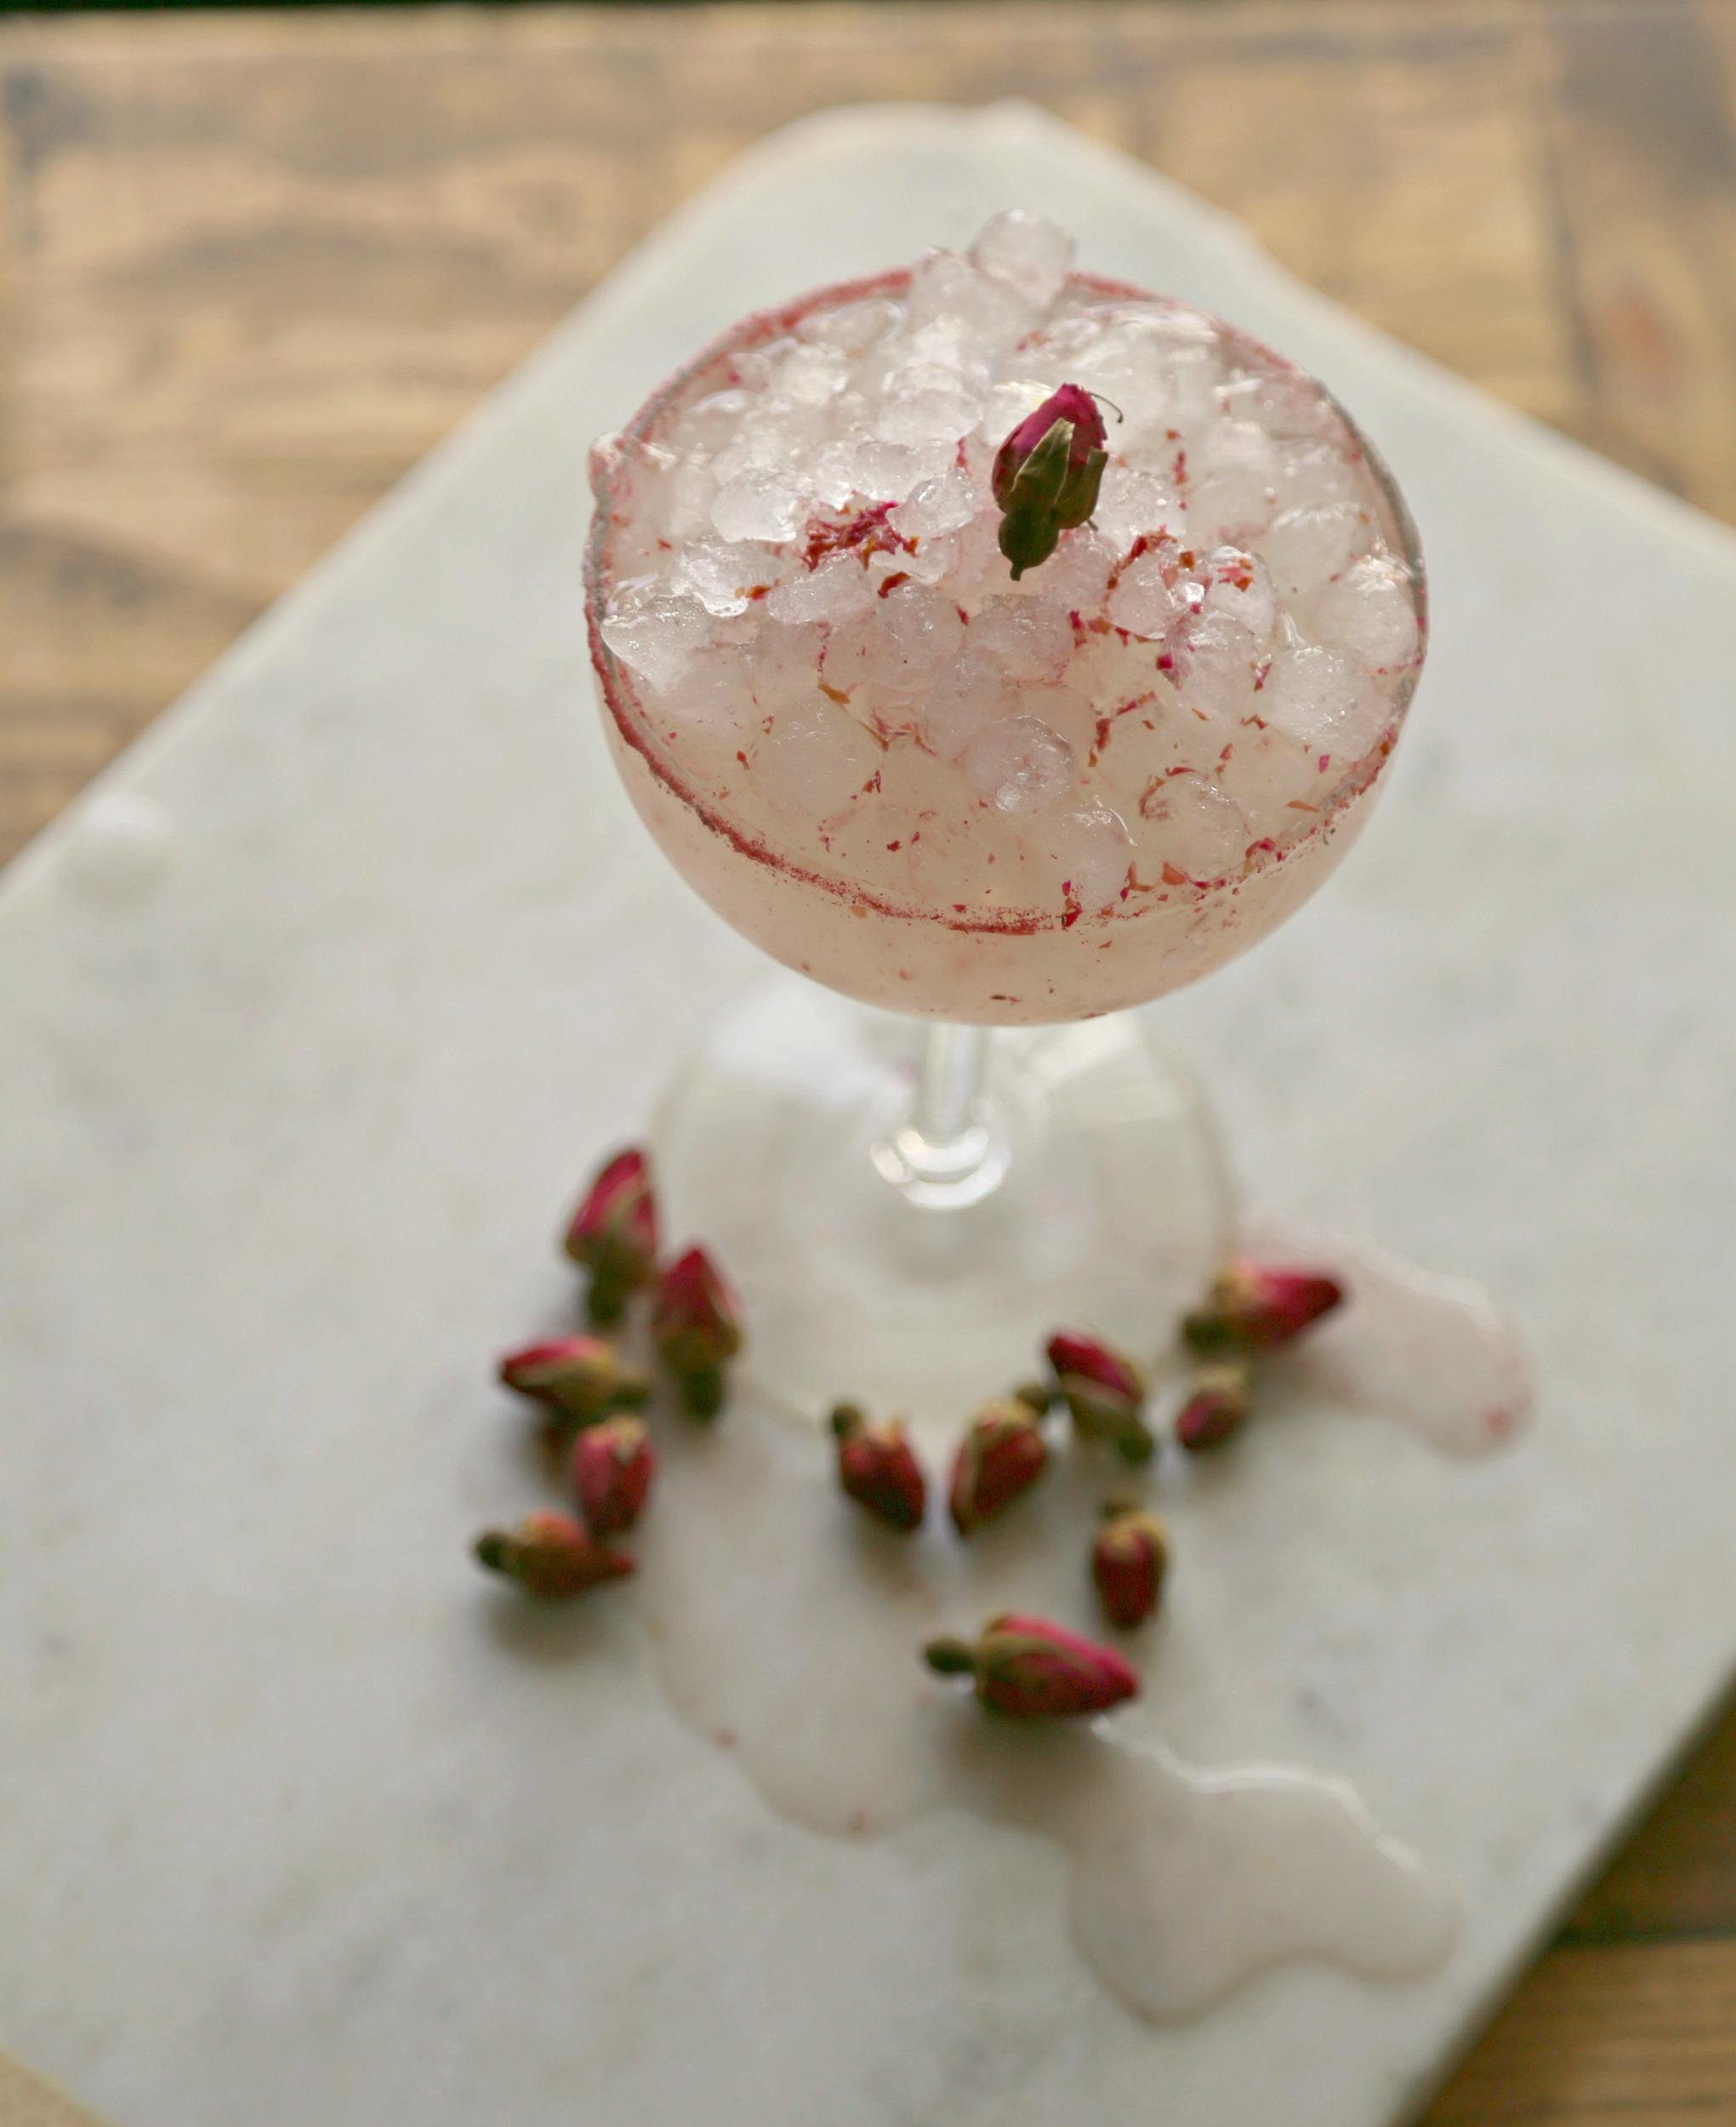 rose-margarita-rose-salt-rim-tequila-vianneyrodriguez-sweetlifebake